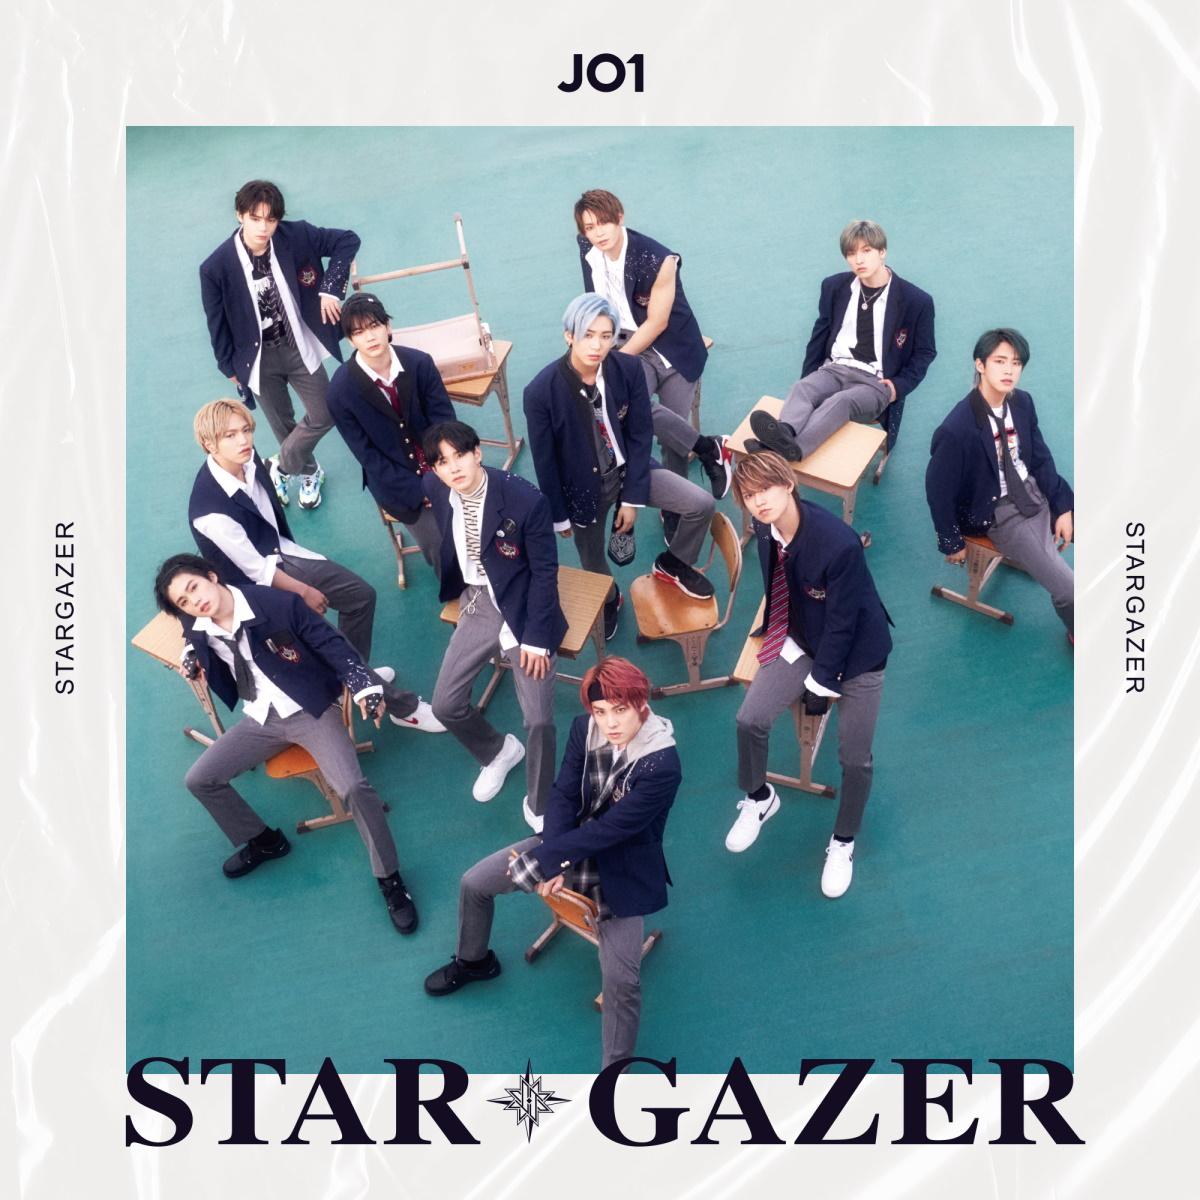 『JO1 - Voice (君の声) 歌詞』収録の『STARGAZER』ジャケット